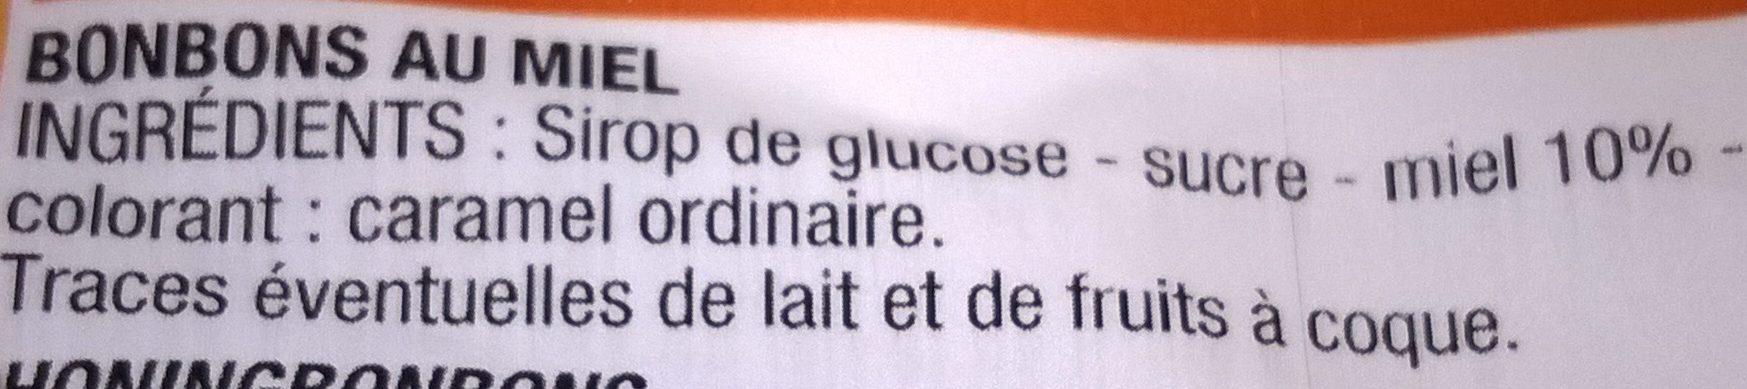 Bonbons au miel - Ingredients - fr